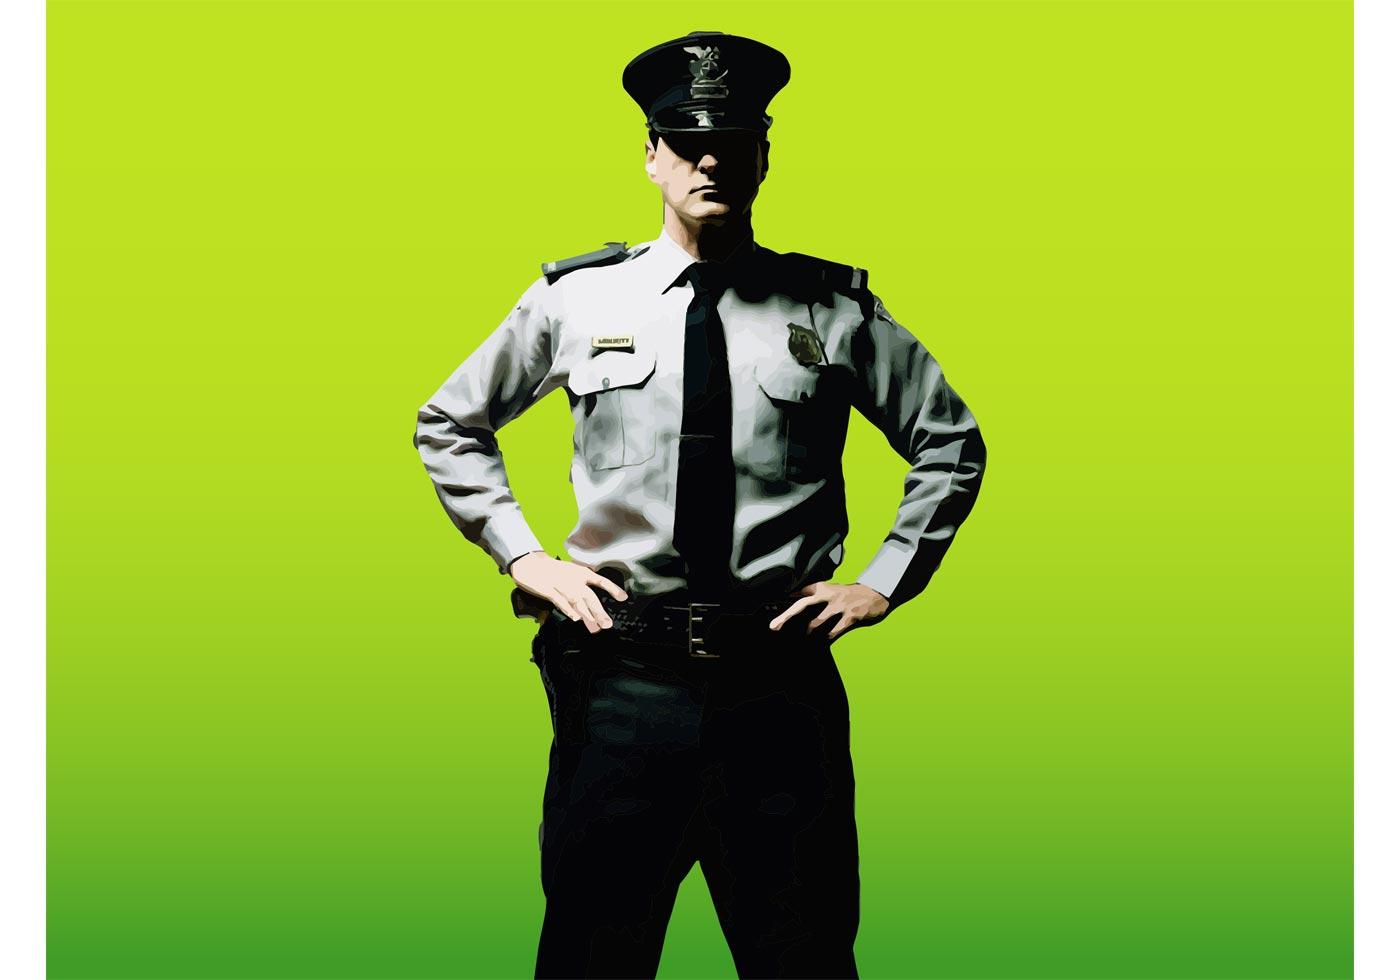 Security Guard Vector - Download Free Vector Art, Stock ...